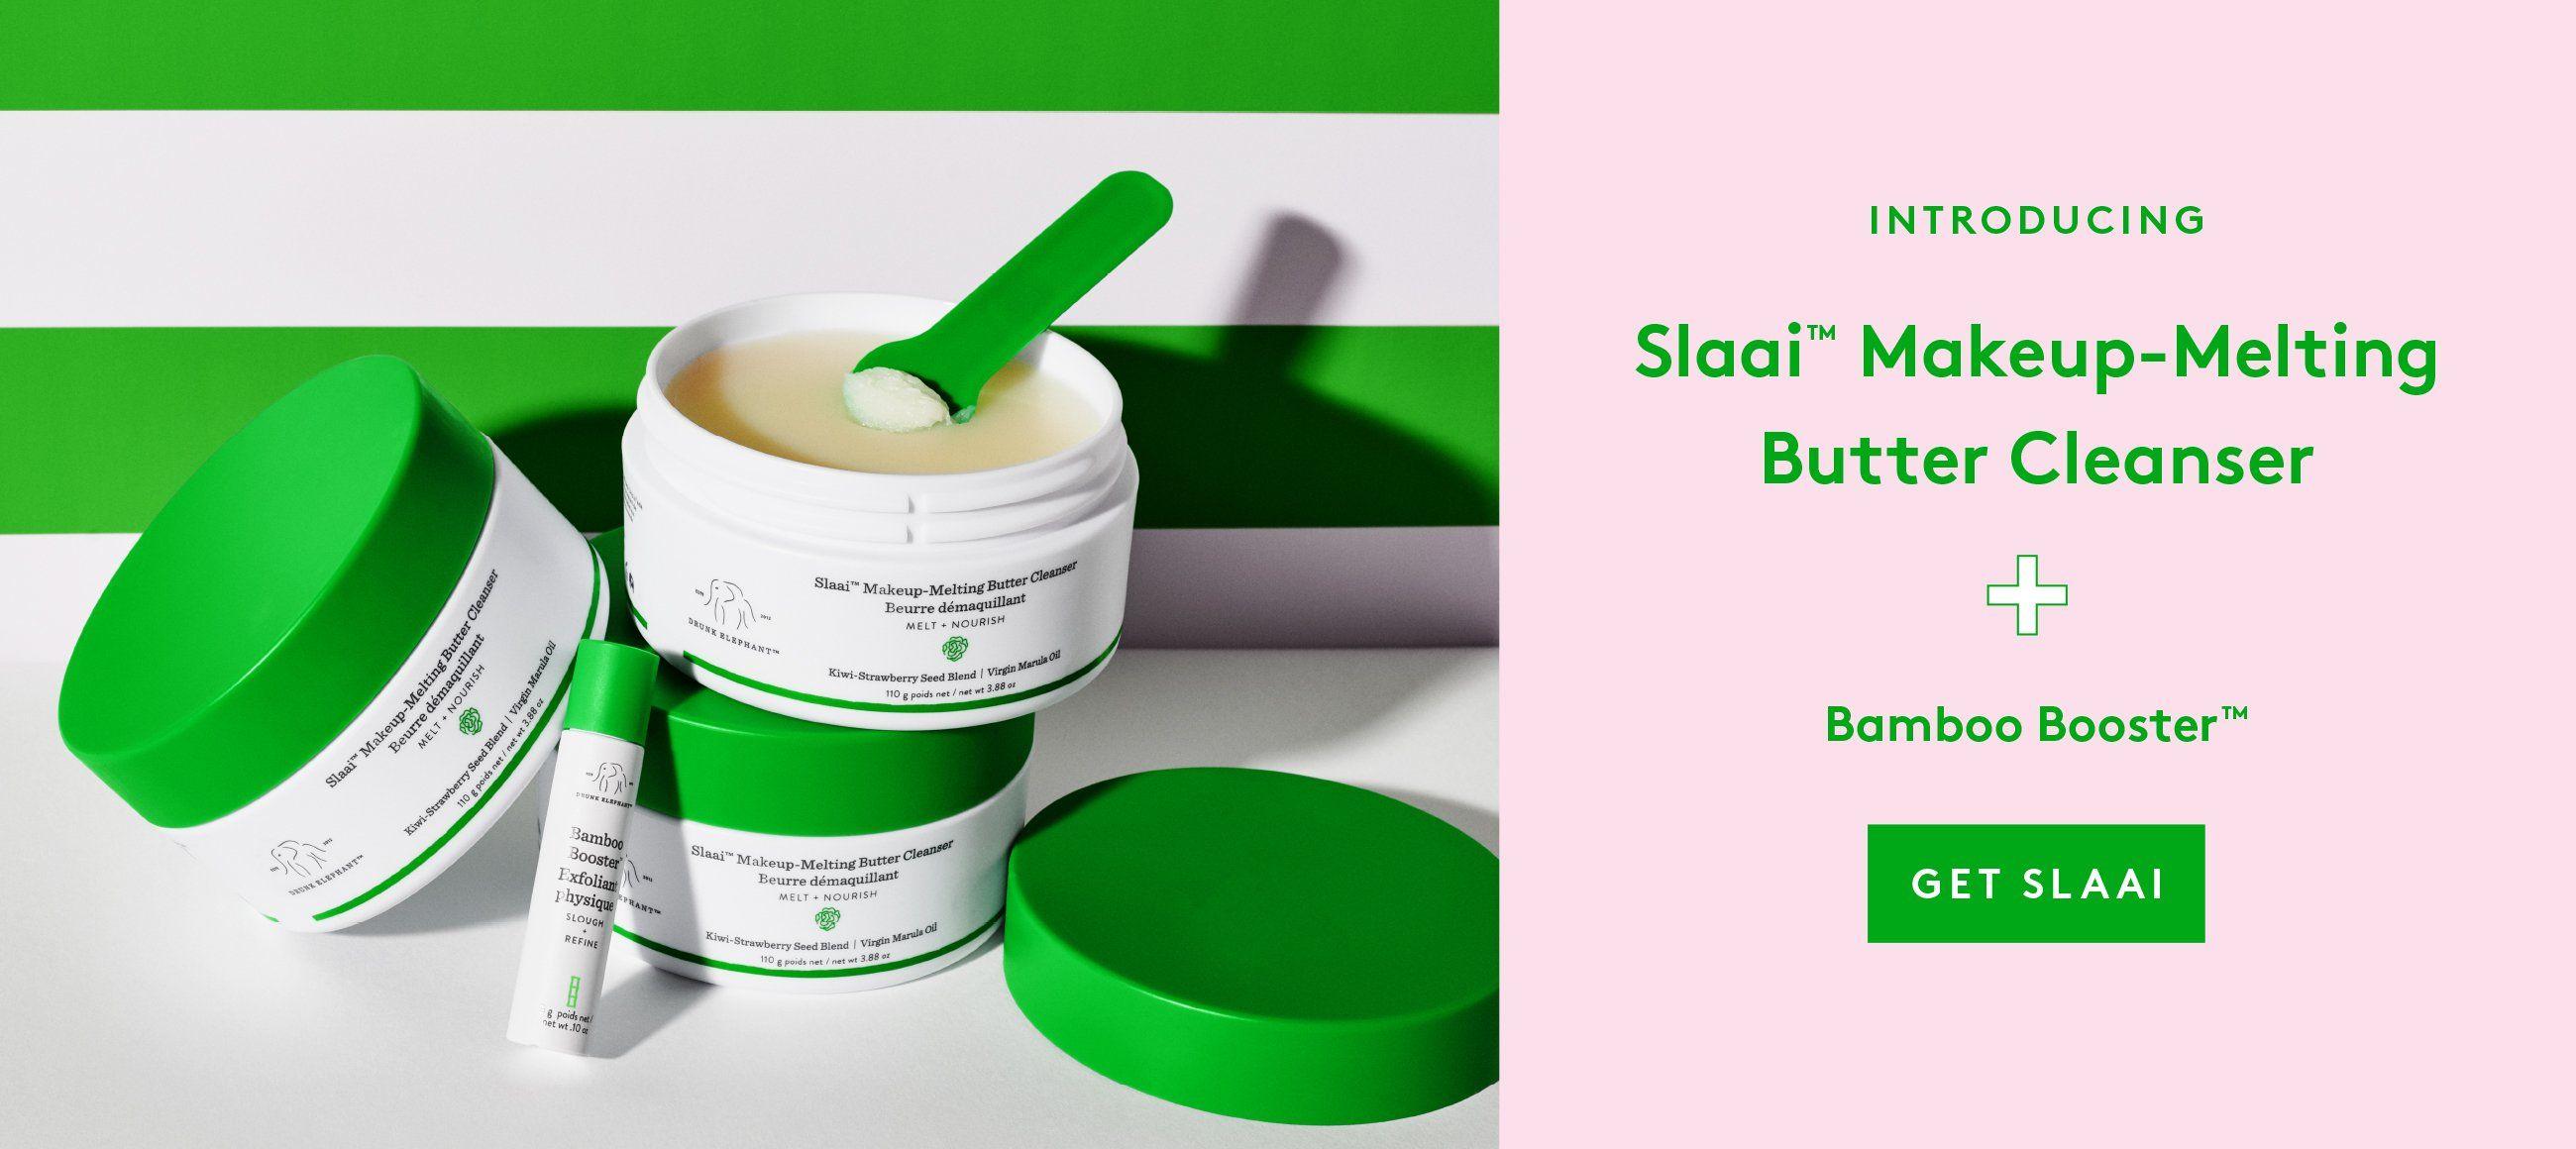 Slaai™ MakeupMelting Butter Cleanser Cleanser, The balm